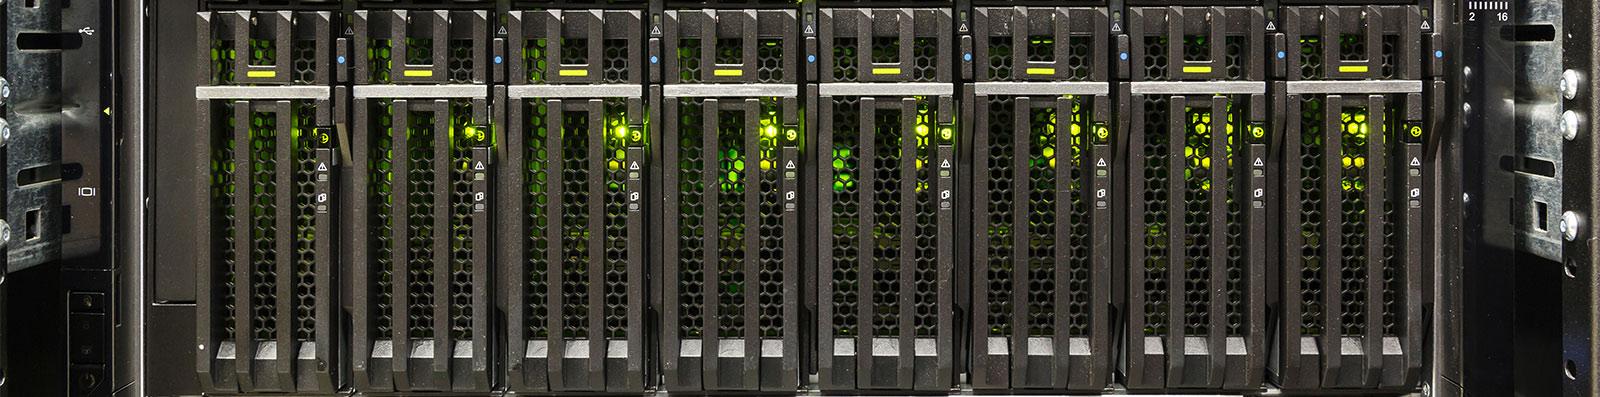 Star Storage Solution Center Server